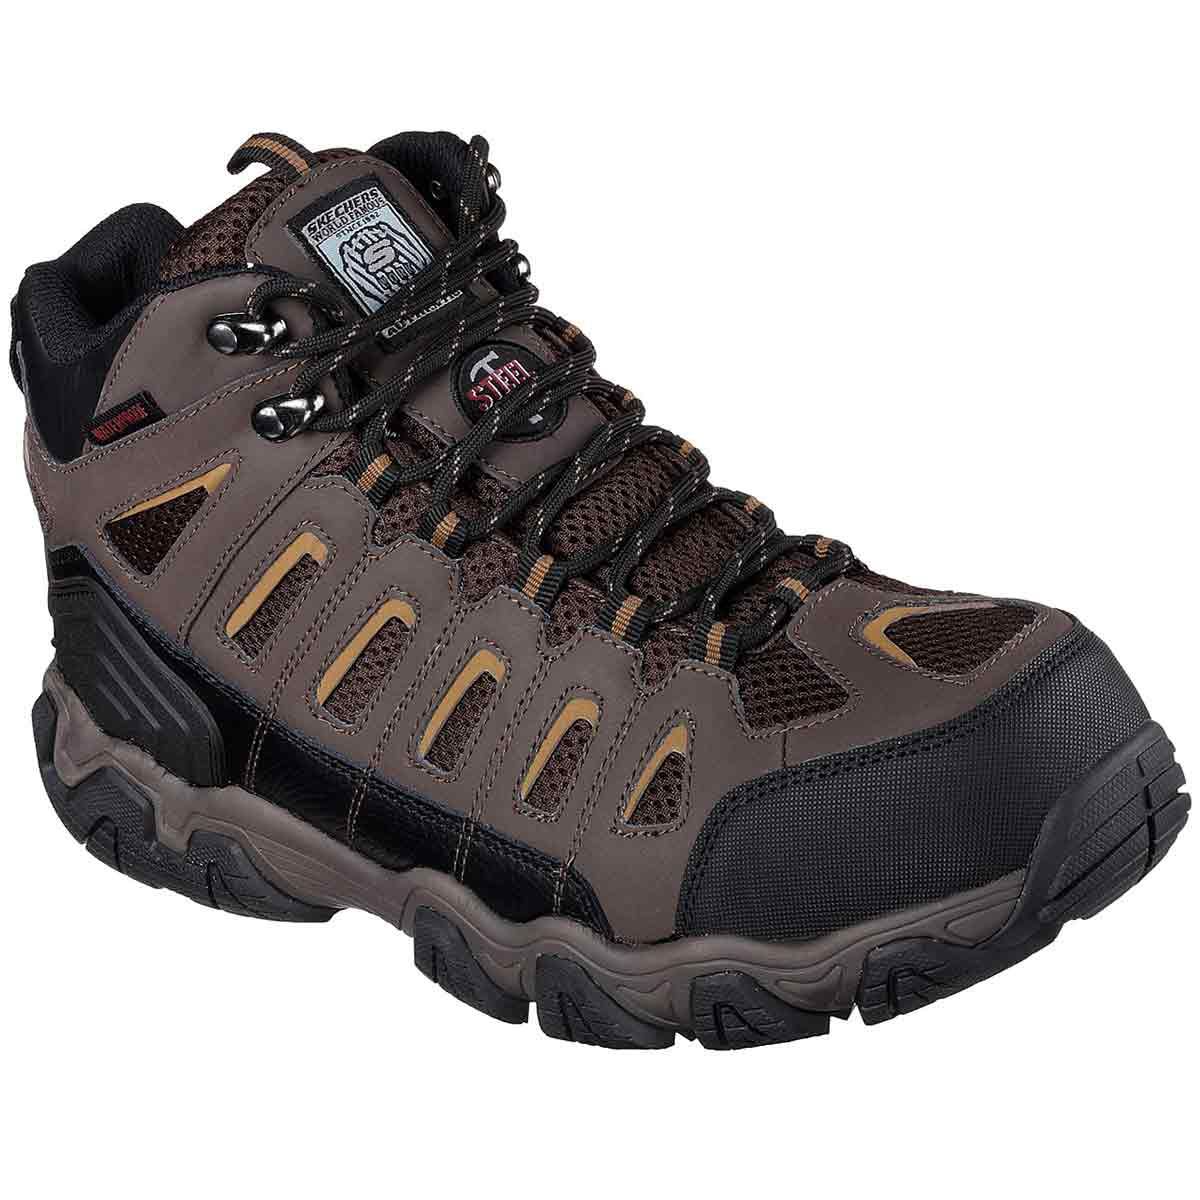 Skechers Men's Blais Bixford Steel Toe Work Shoes - Brown, 10